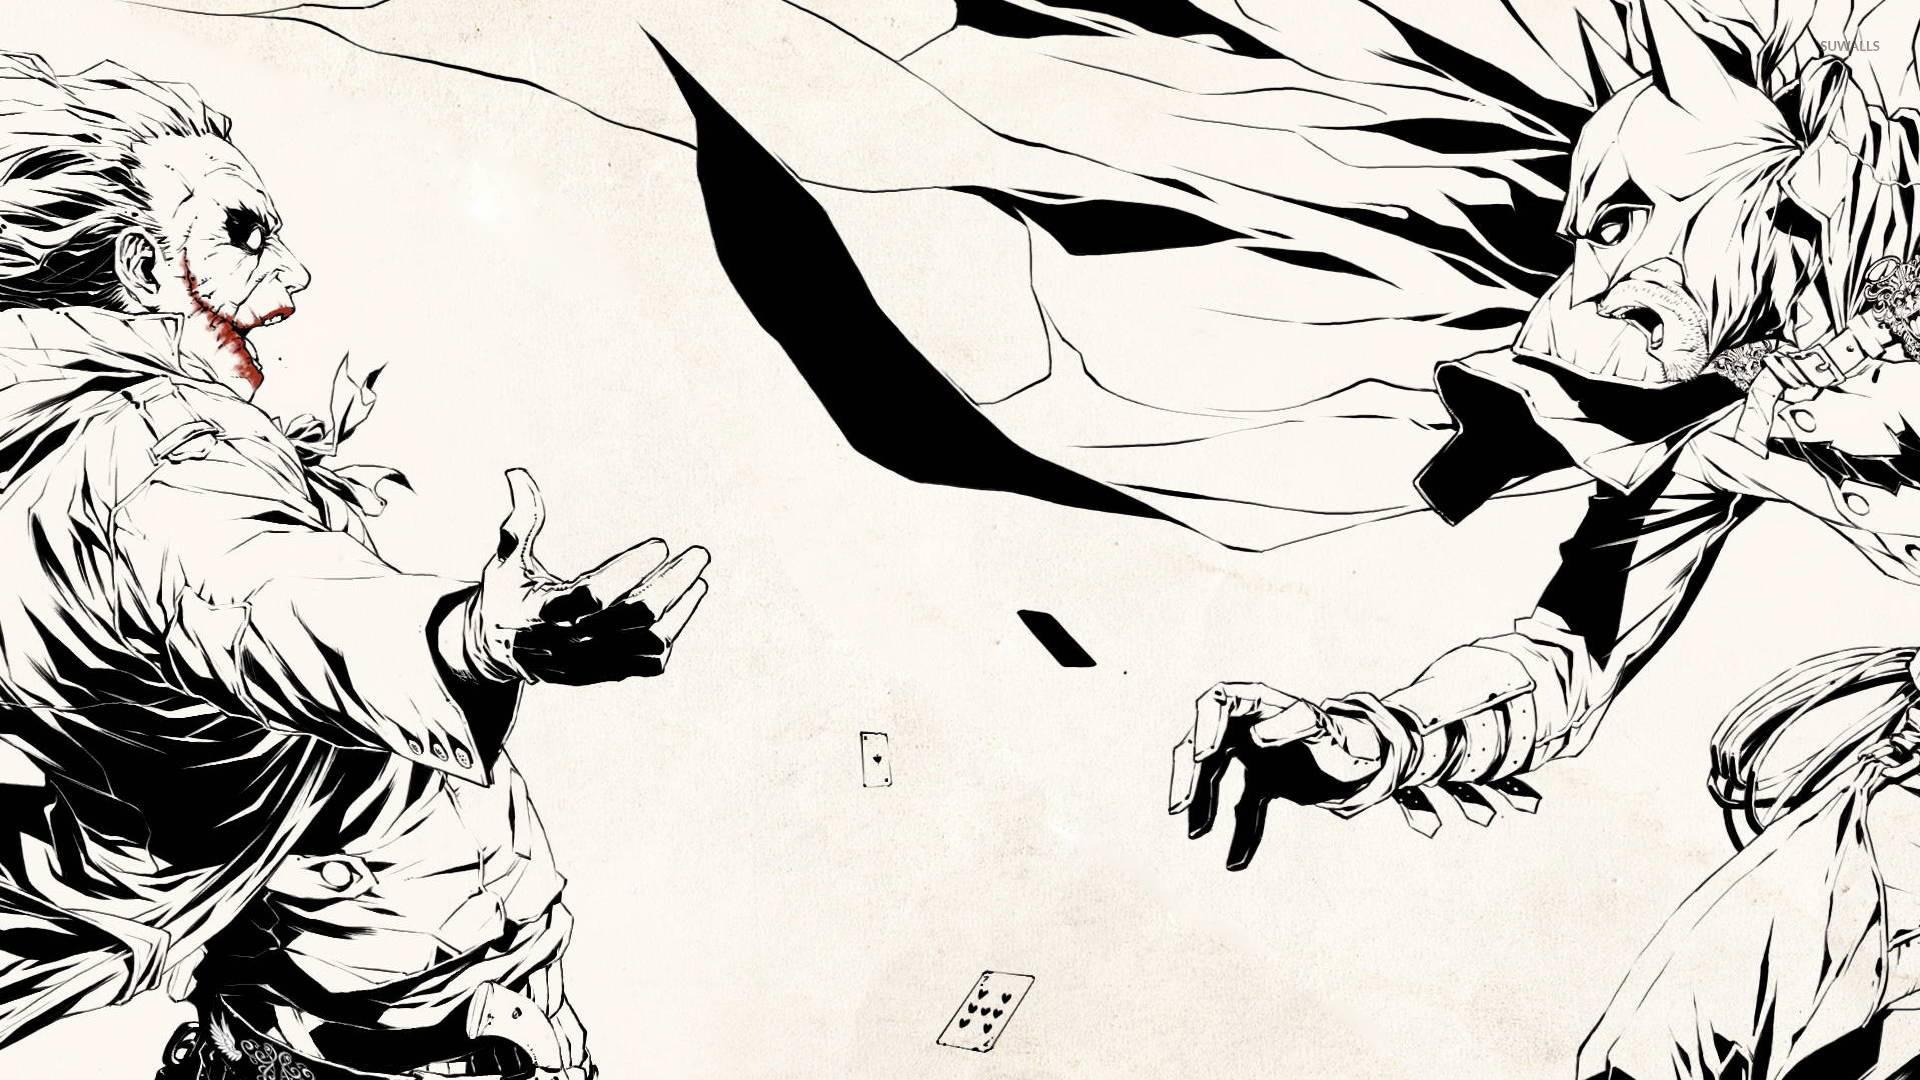 Batman Vs Joker Wallpaper